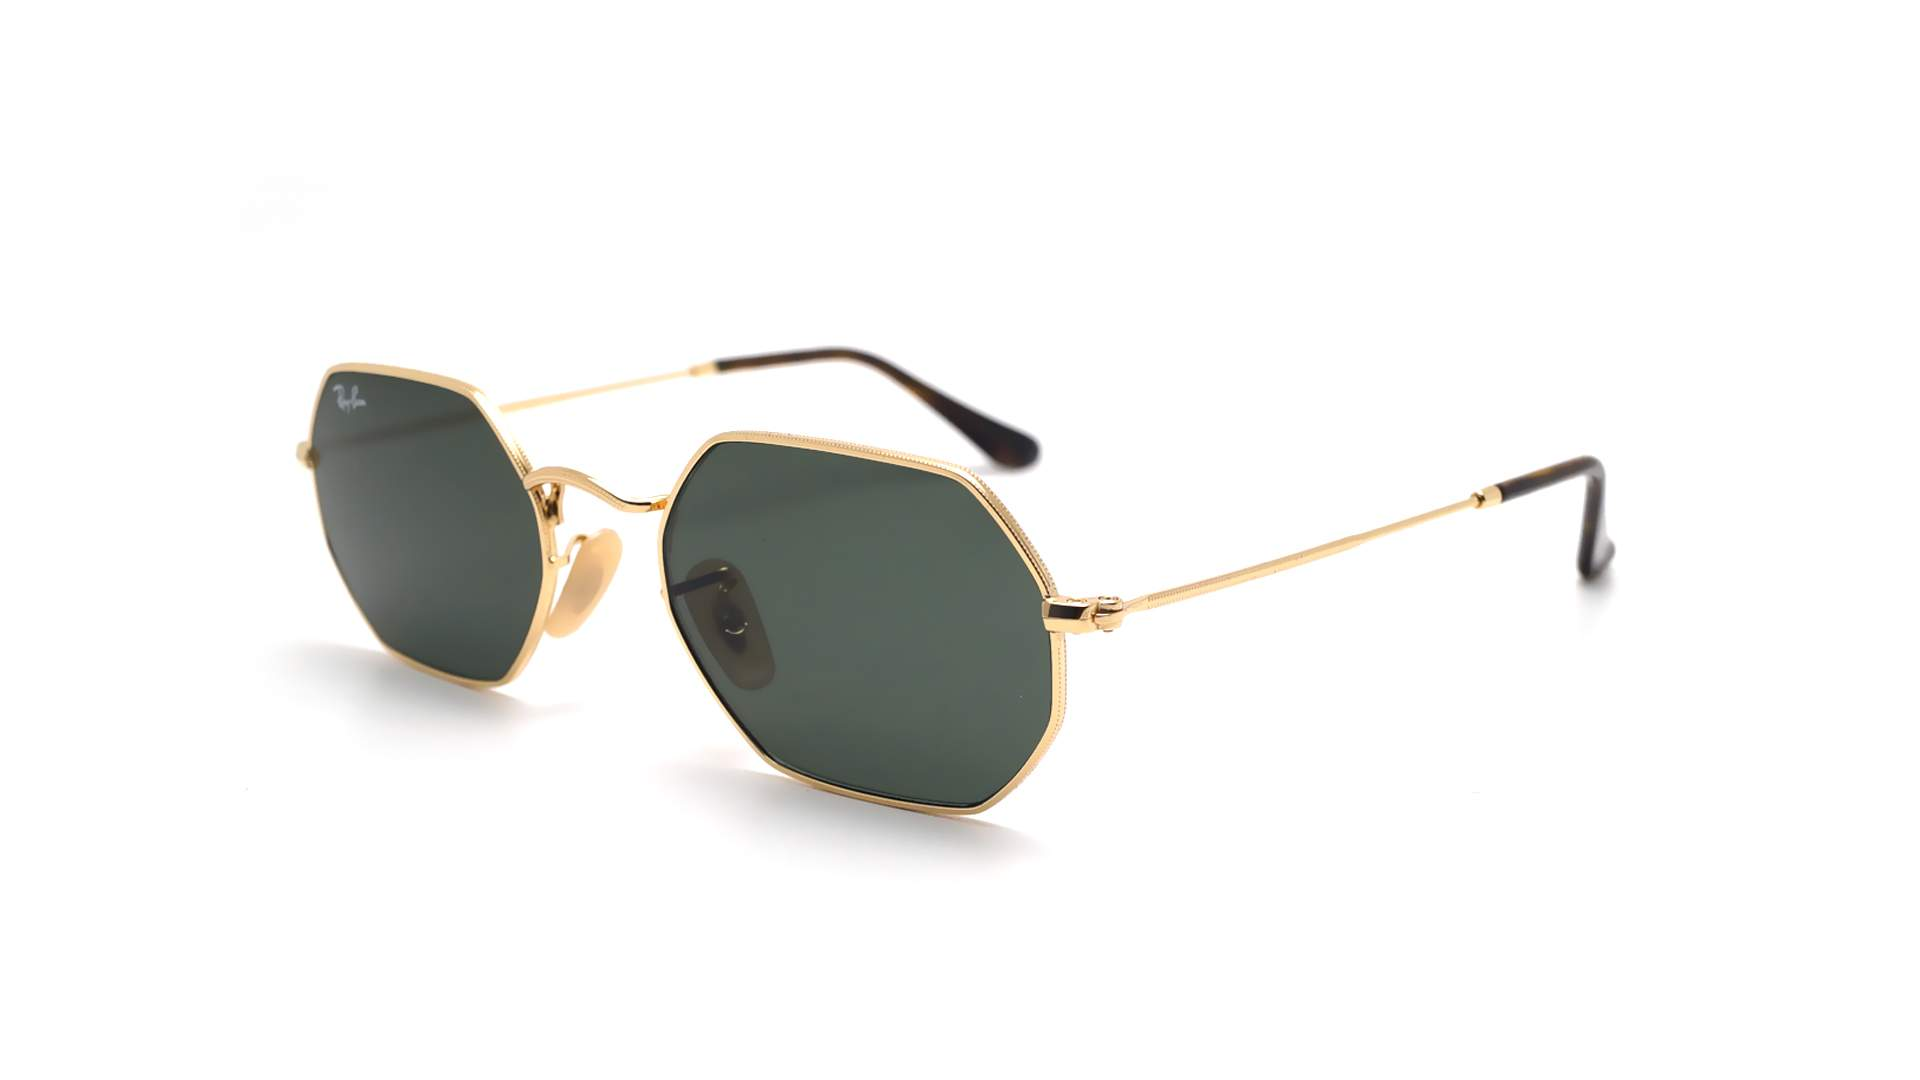 b3078f5c13 Sunglasses Ray-Ban Octagonal Gold RB3556N 001 53-21 Medium